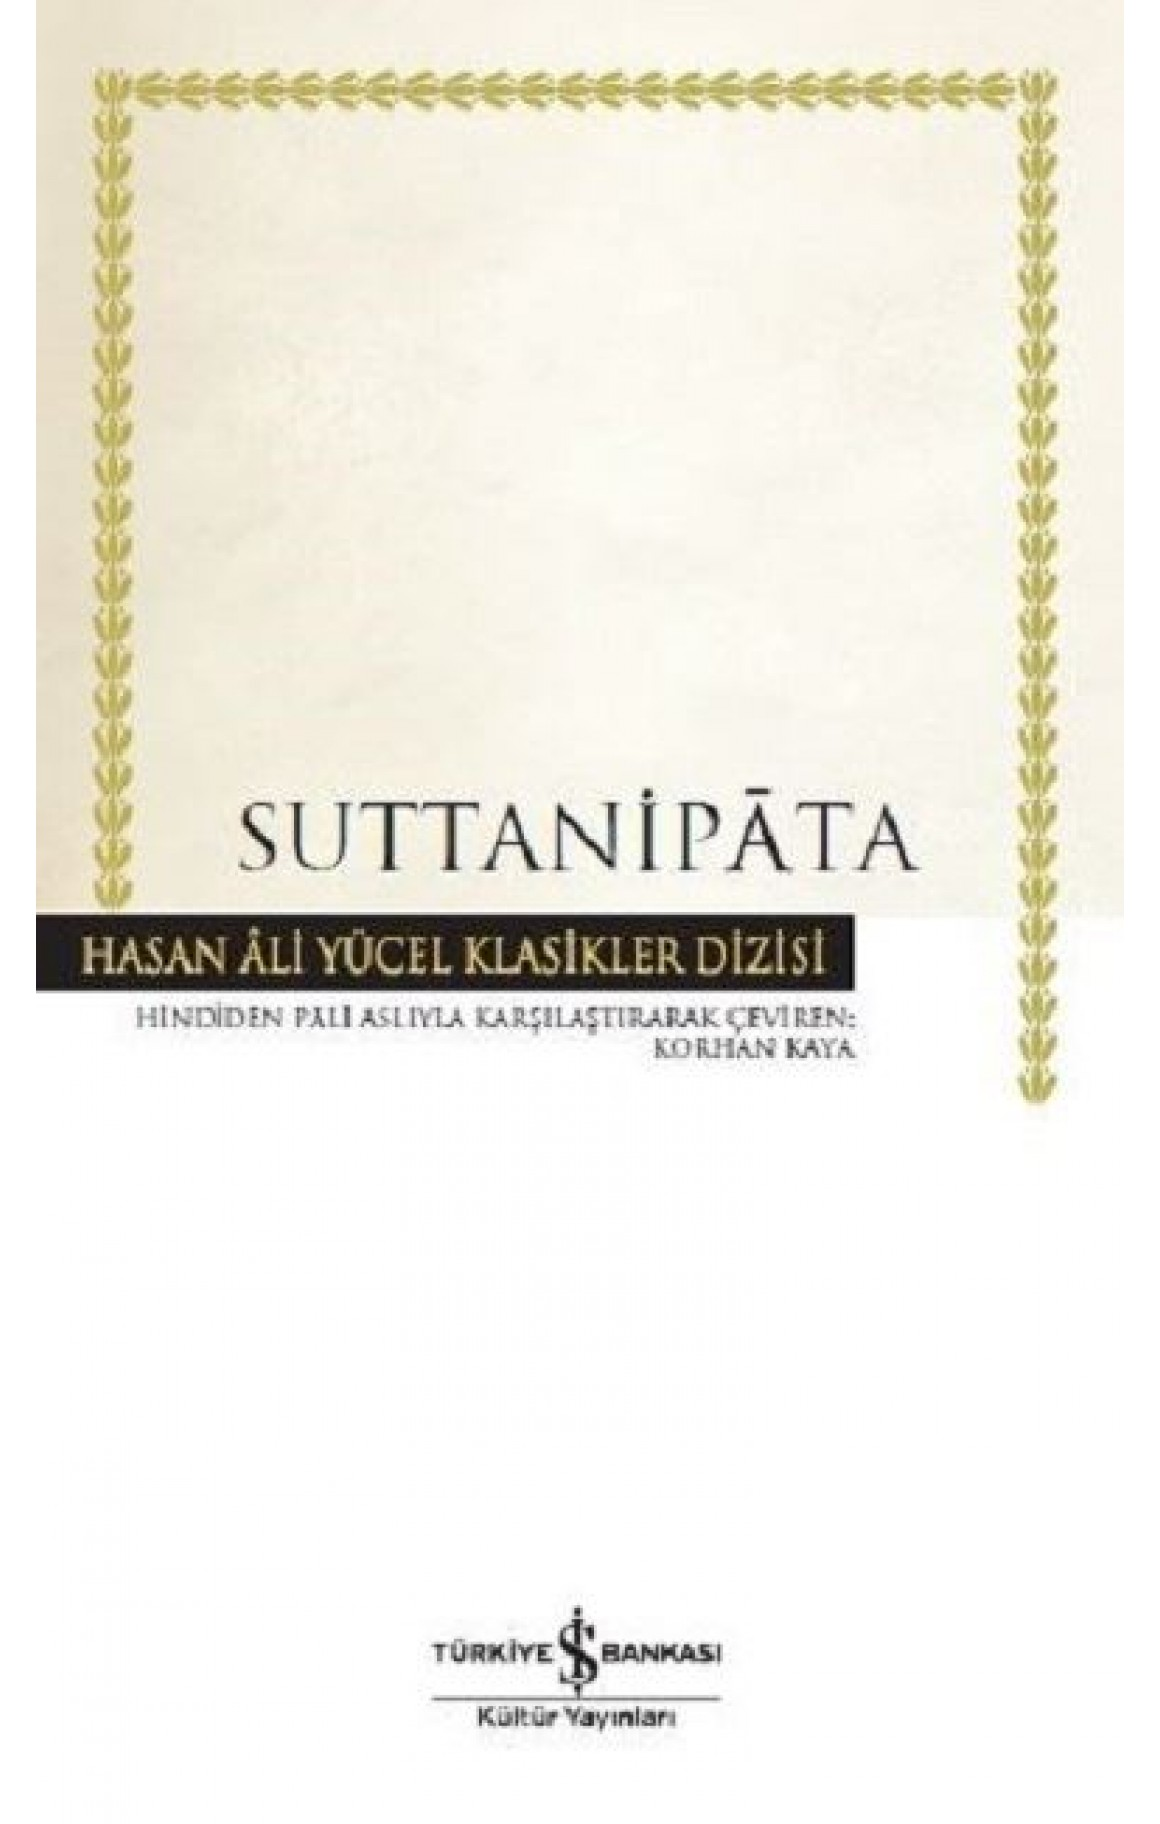 Suttanipata-Hasan Ali Yücel Klasikler